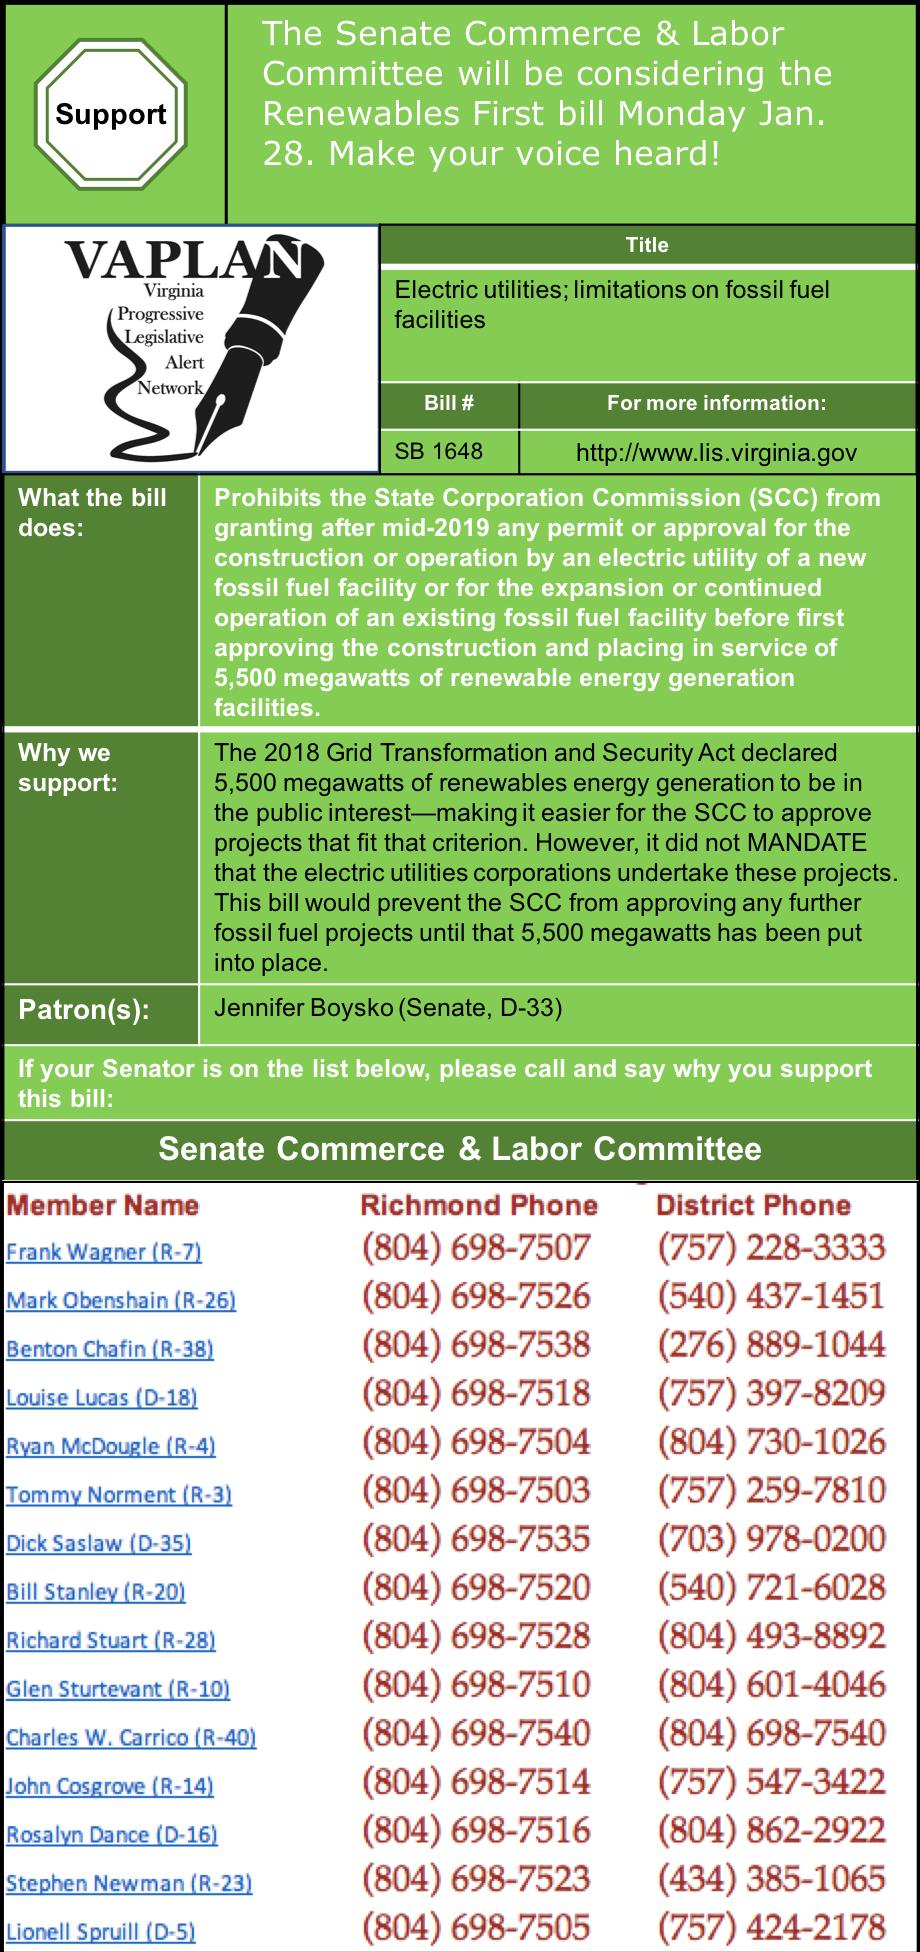 ALERT: Senate Commerce & Labor to consider Renewables First bill on Monday Jan. 28.